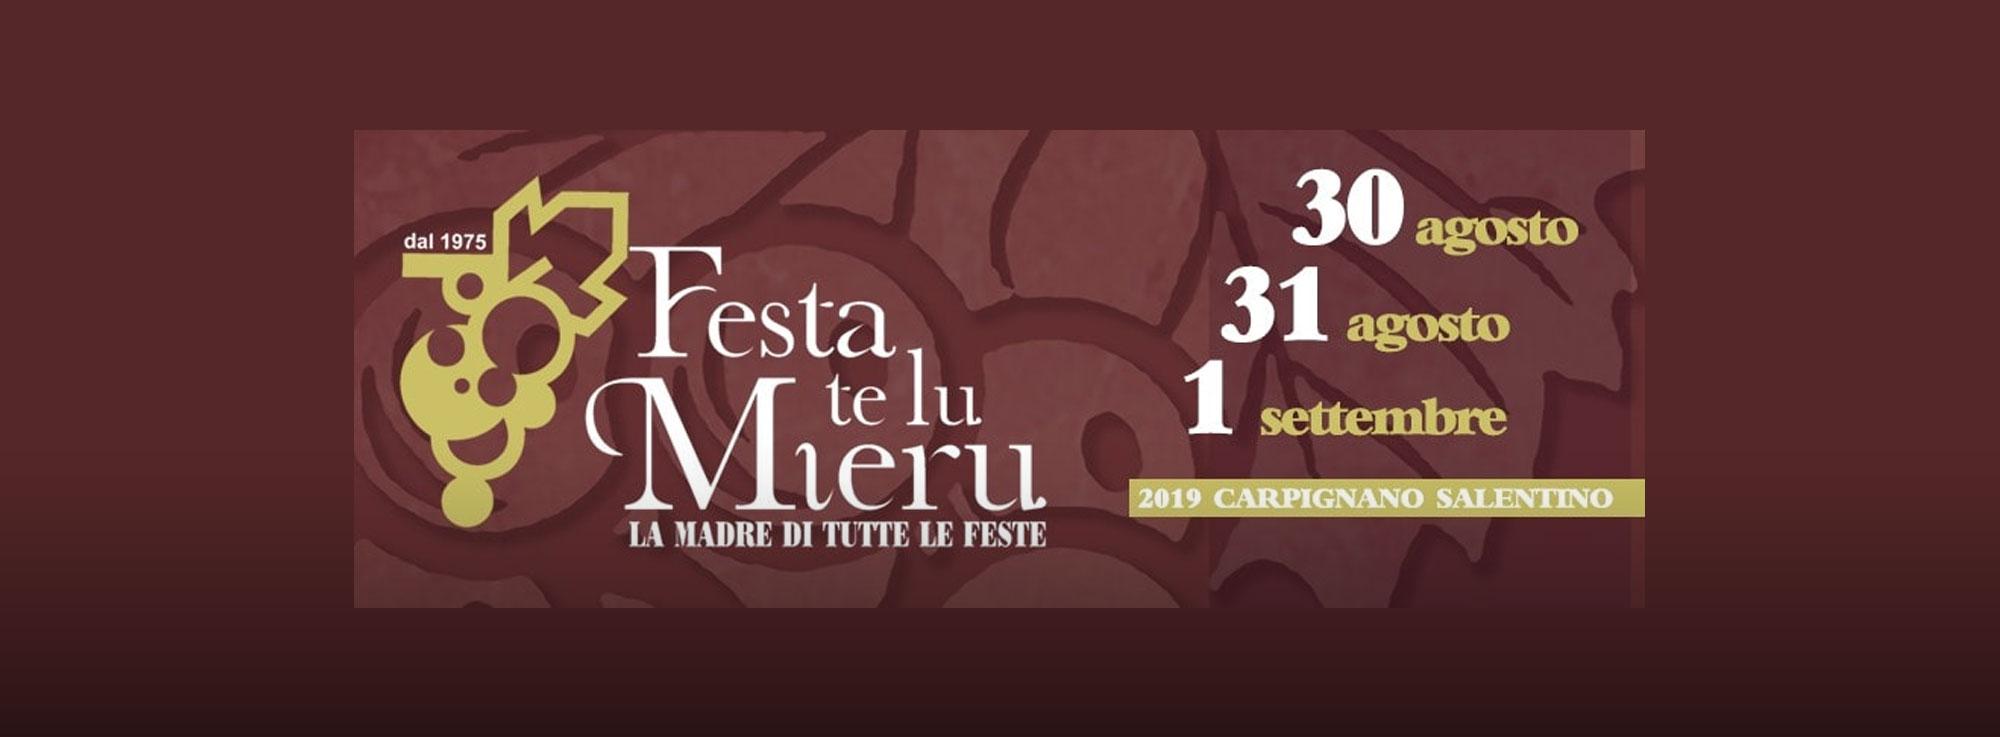 Carpignano Salentino: Festa Te lu Mieru